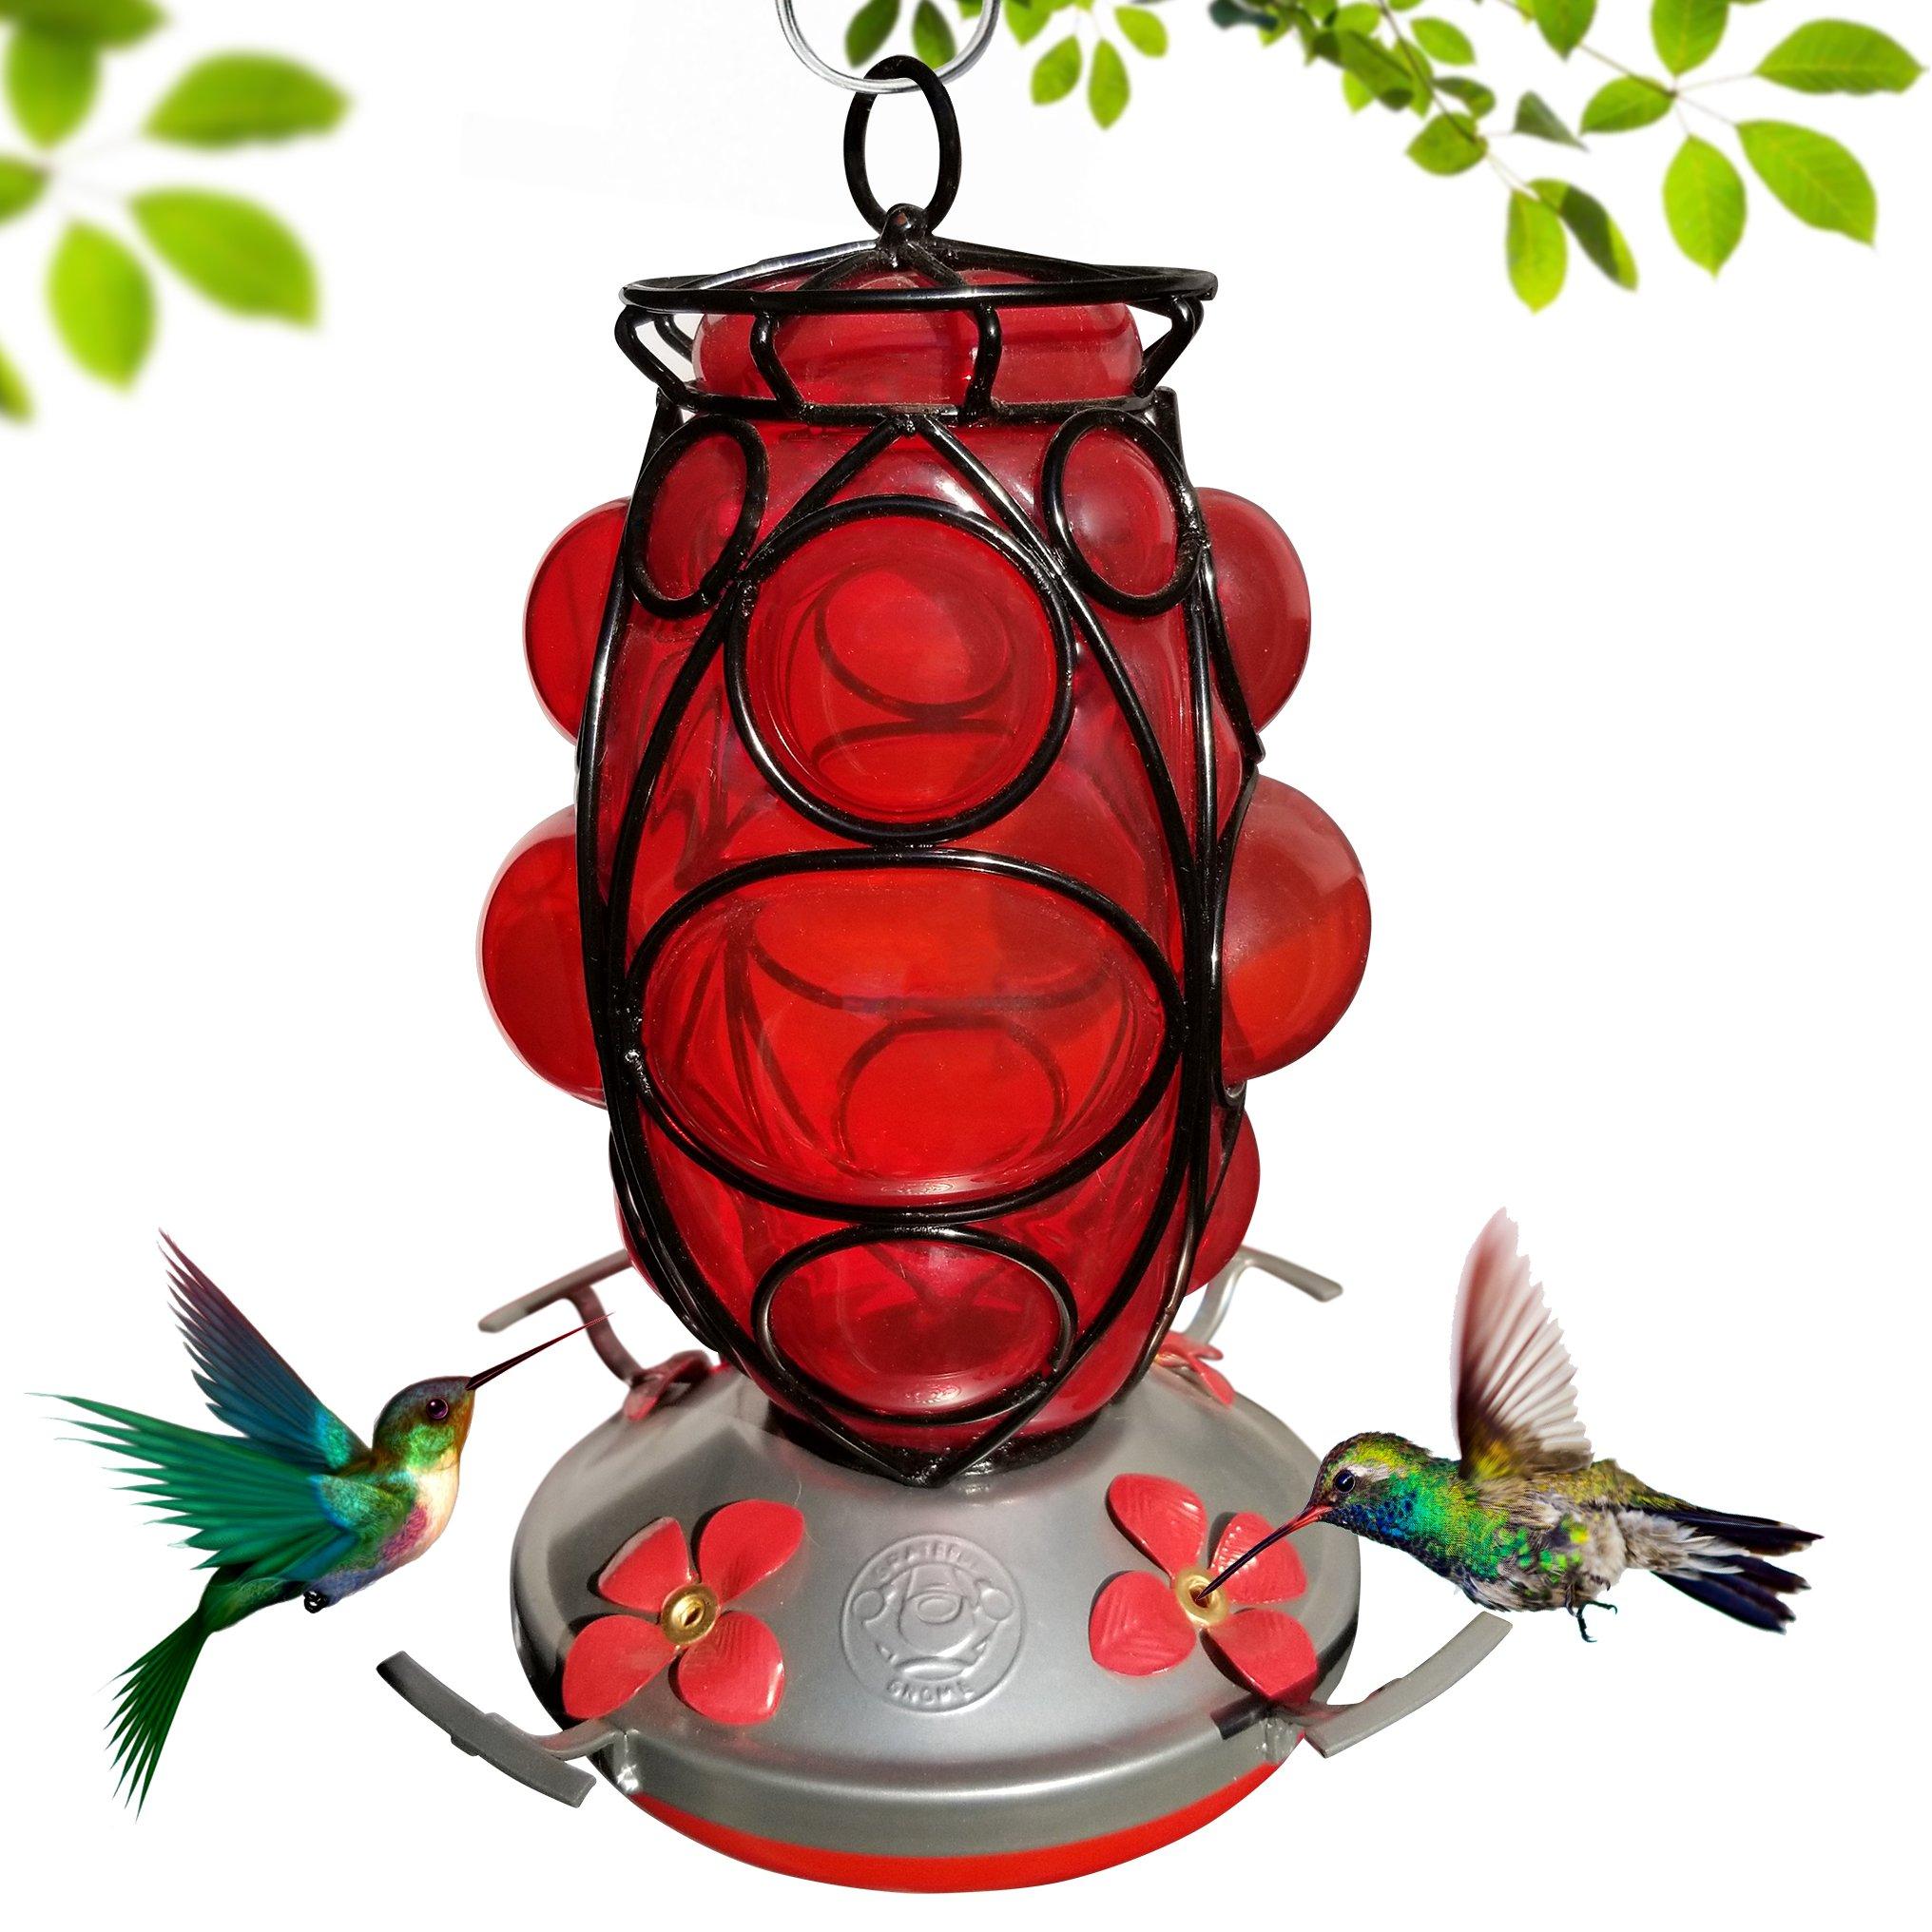 Grateful Gnome Hummingbird Feeder - Hand Blown Glass - Morroccan Lantern